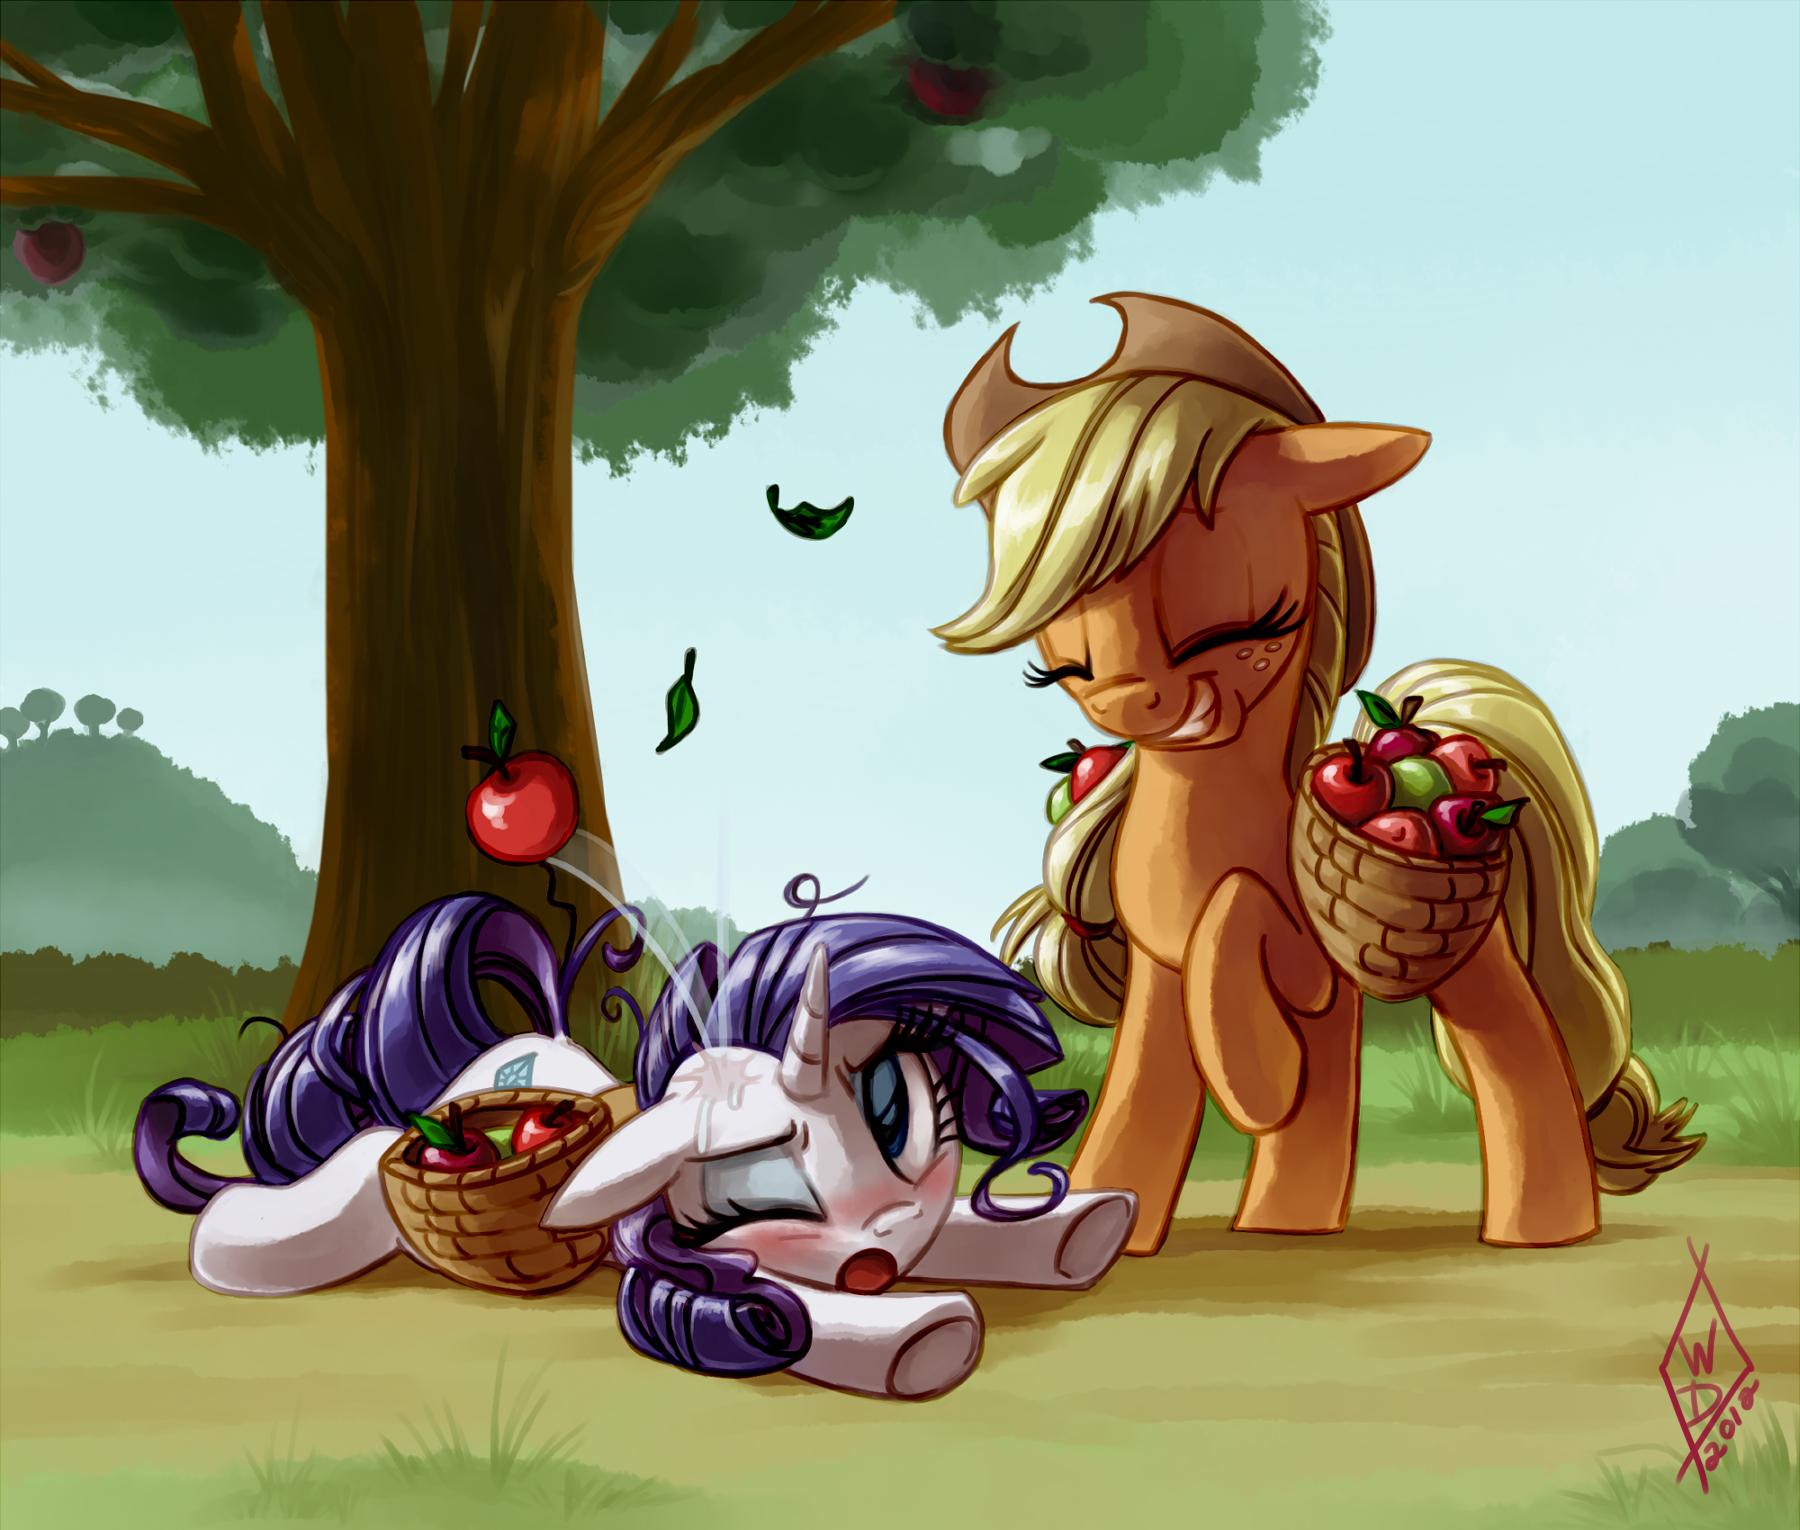 Commission: Applebucking is HARD by WhiteDiamondsLtd